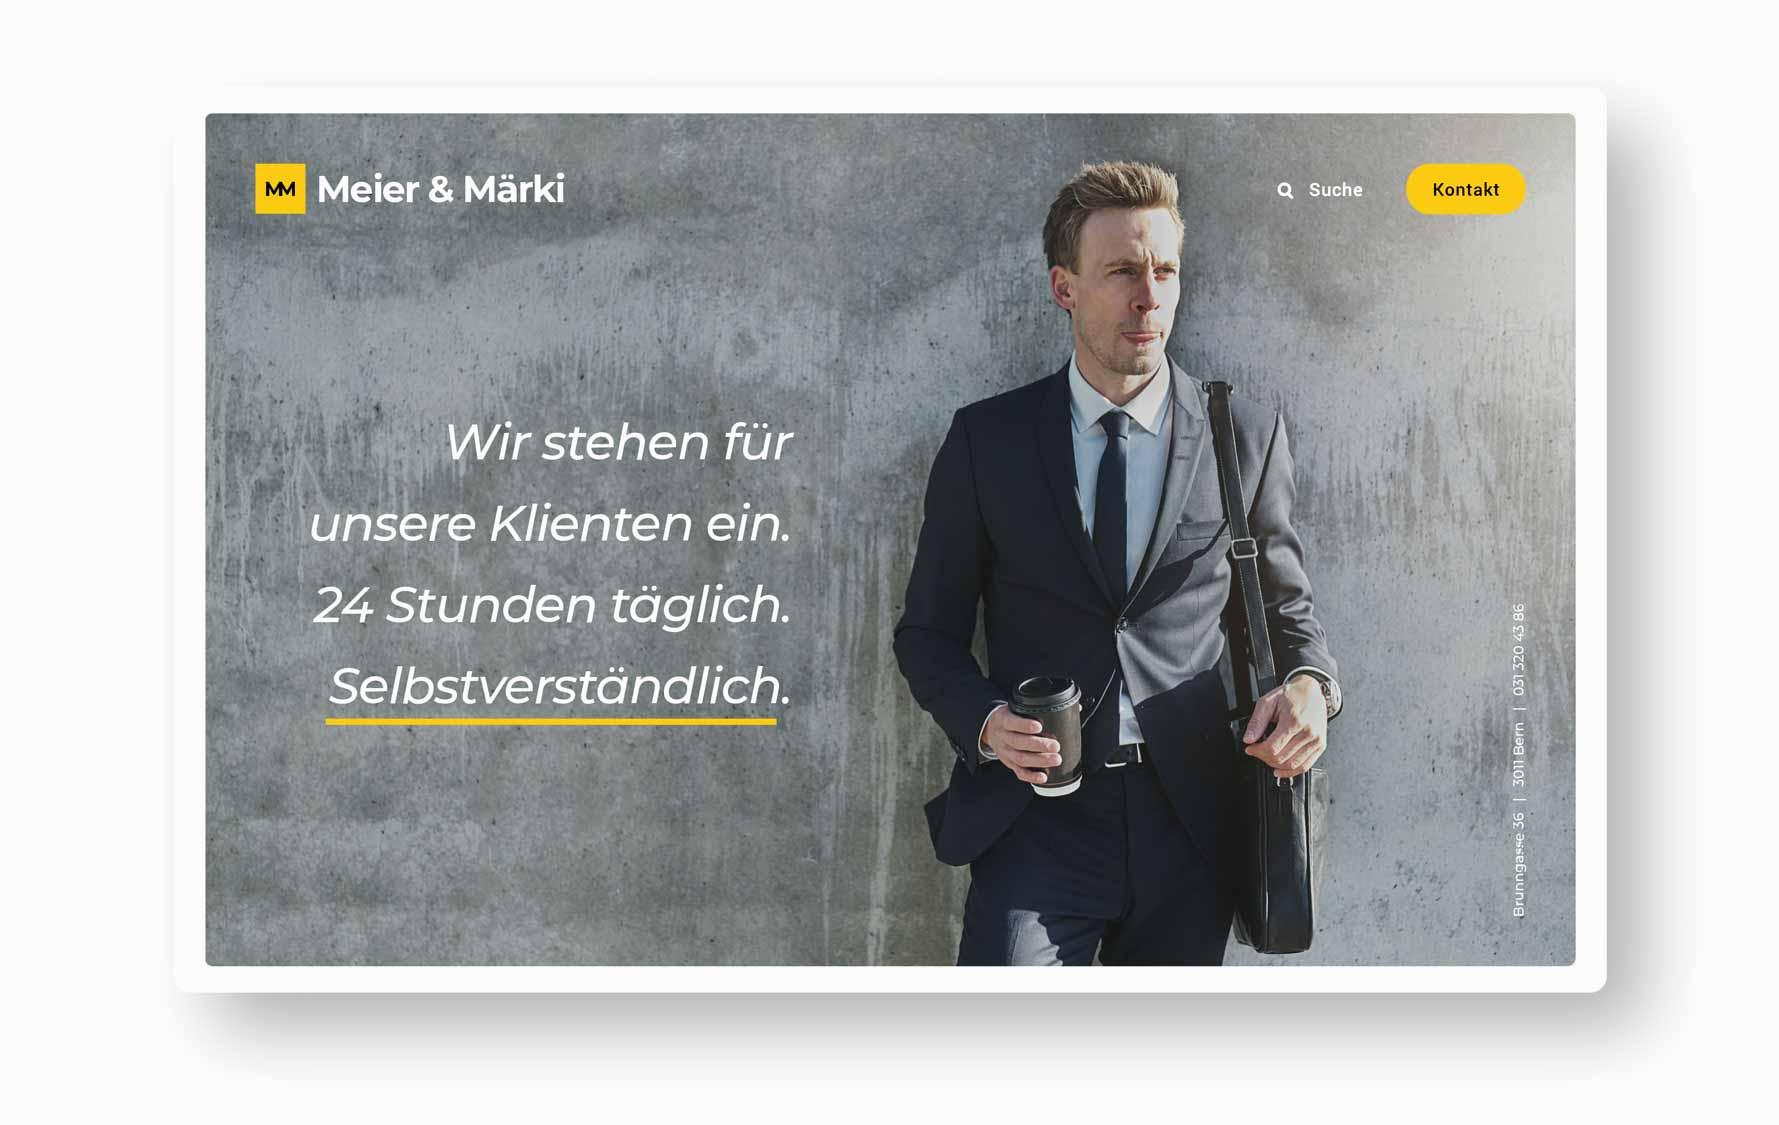 Landingpage - Webdesign Anwaltskanzlei Schweiz